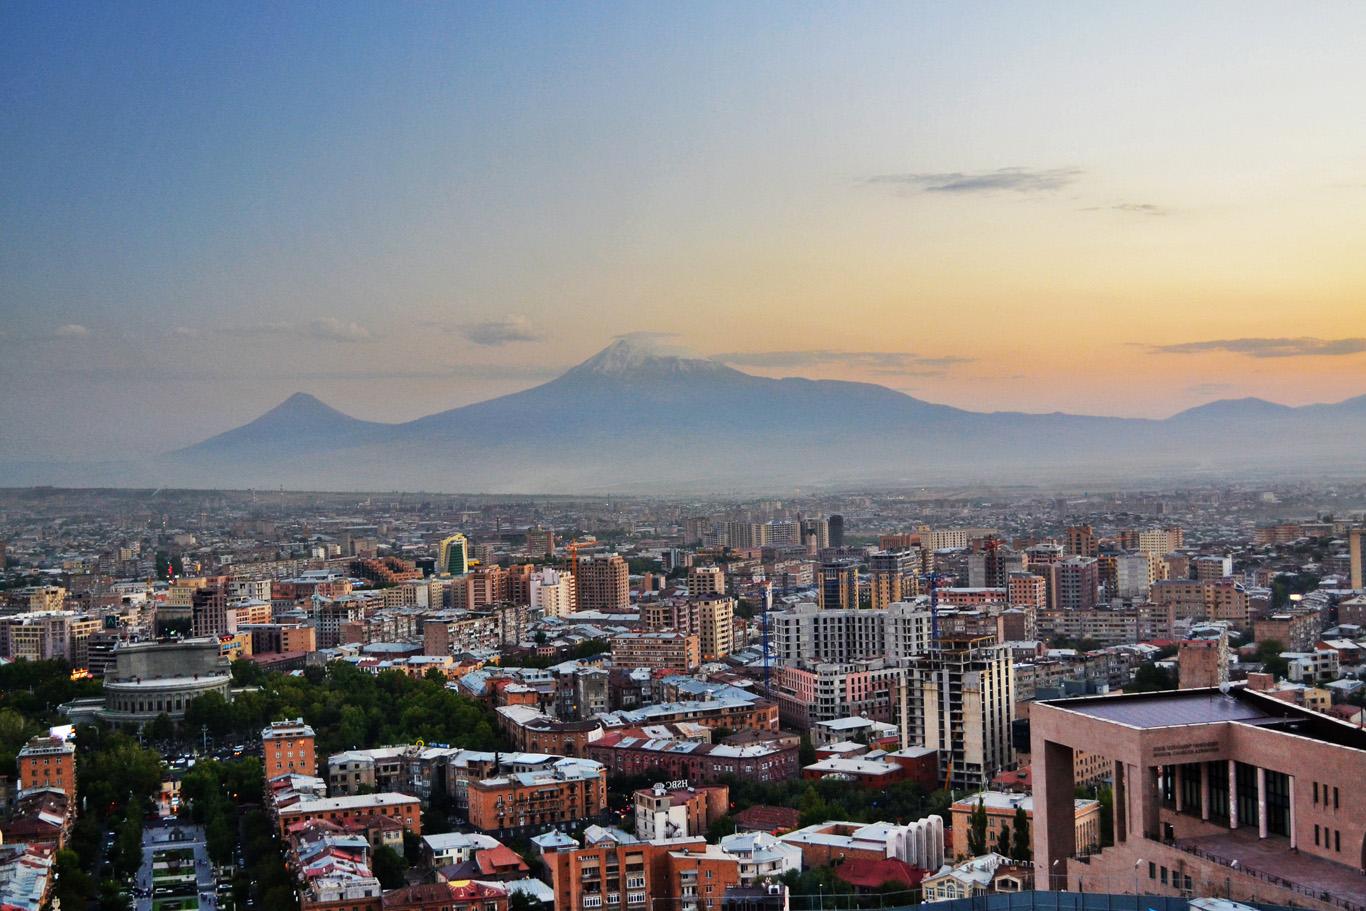 Yerevan with Mount Ararat in the background